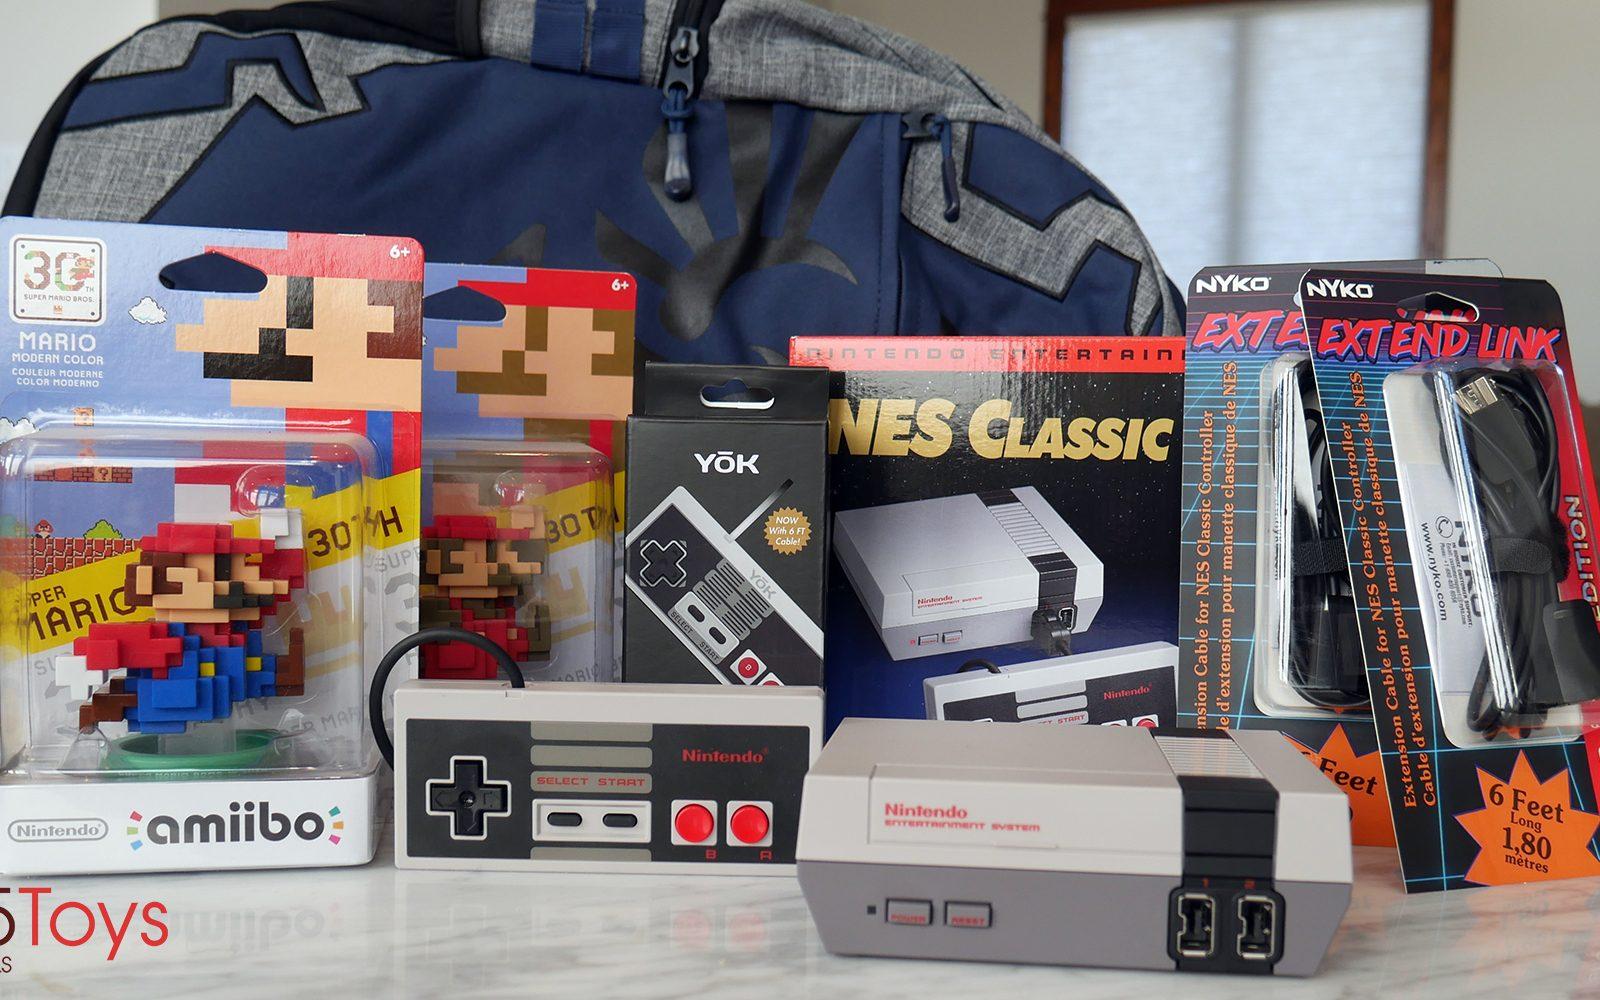 9to5rewards Nes Classic Edition Bundle Giveaway W Extra Controller Nintendo Switch Grey 2game 2amiibo Zelda Backpack 2x Mario Amiibo More 150 Value